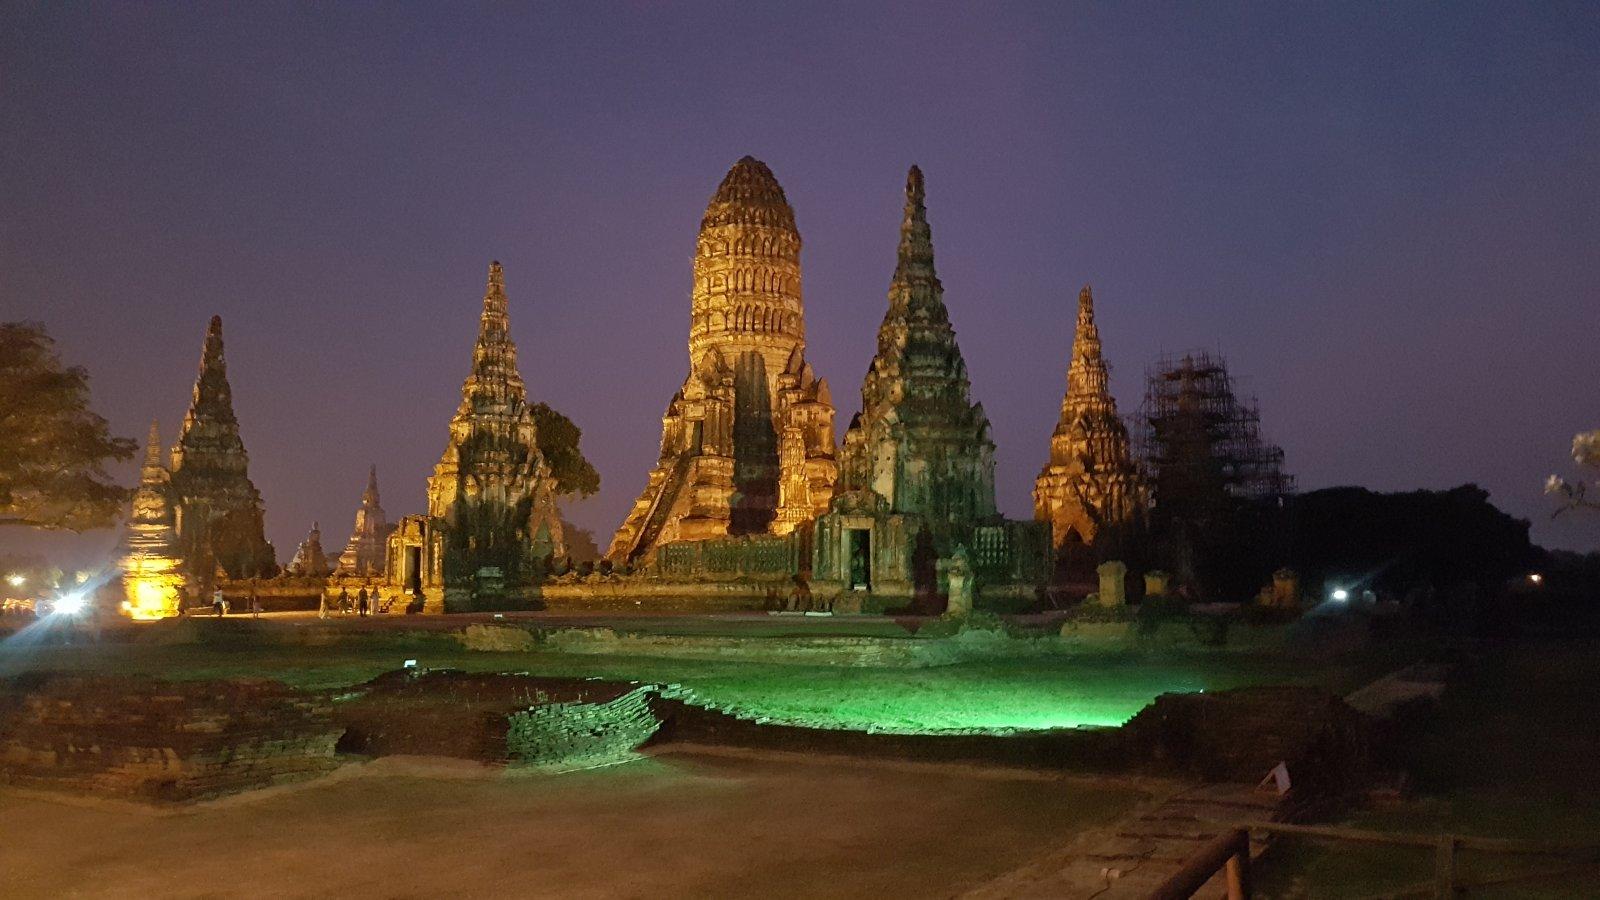 Аюттхая — древняя столица Таиланда